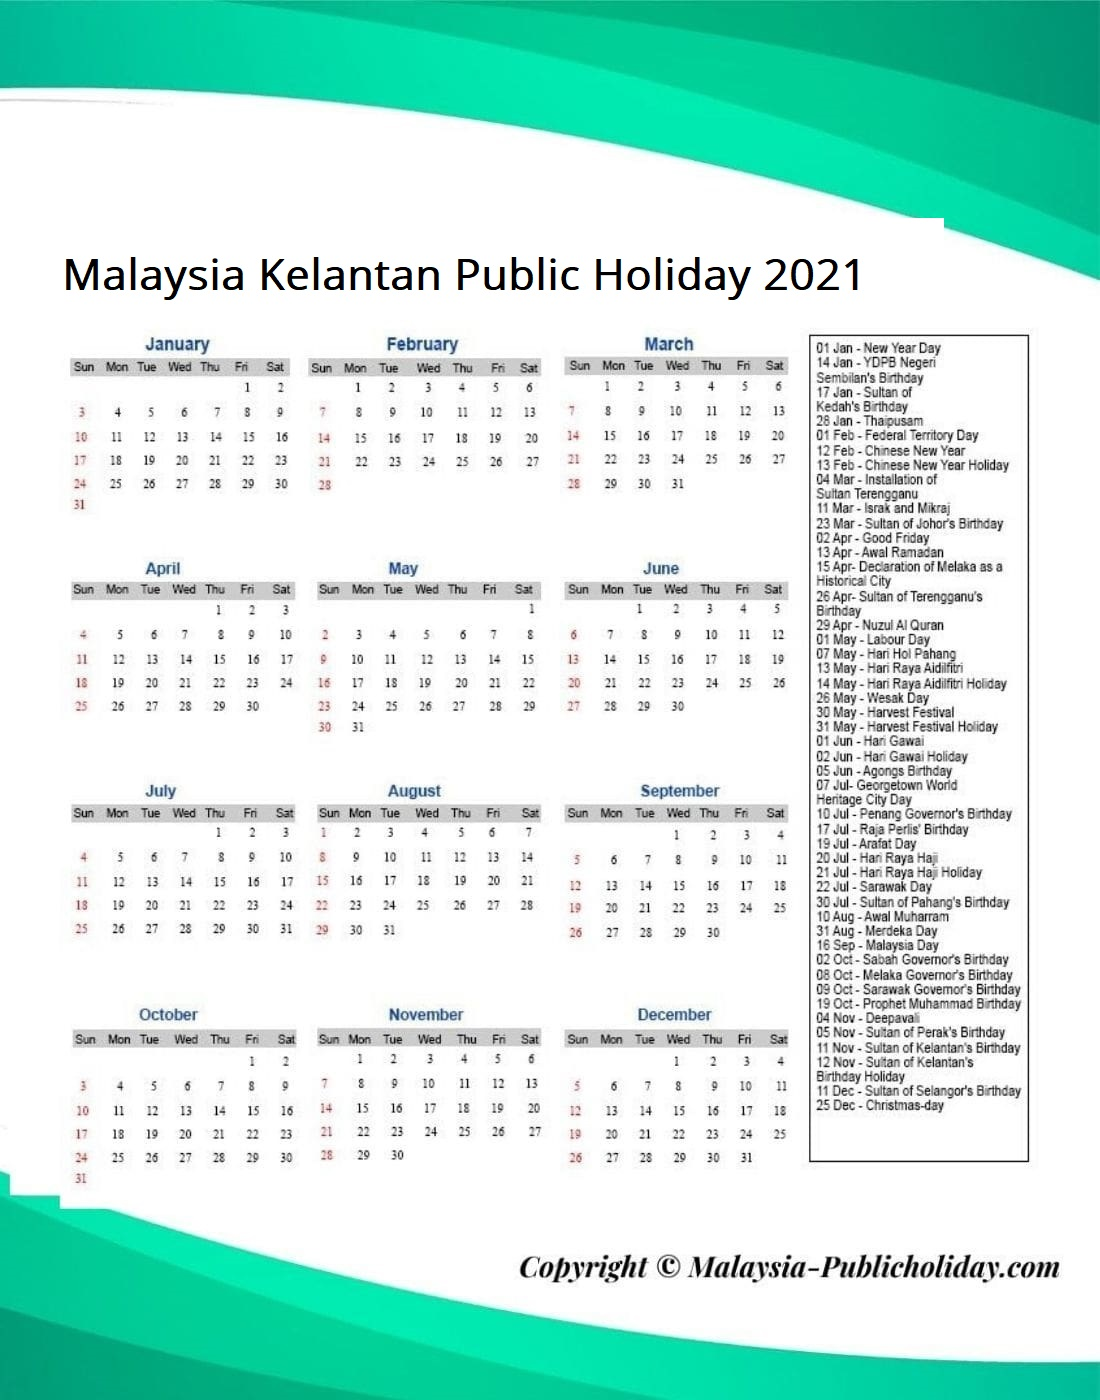 Kelantan Public Holiday 2021